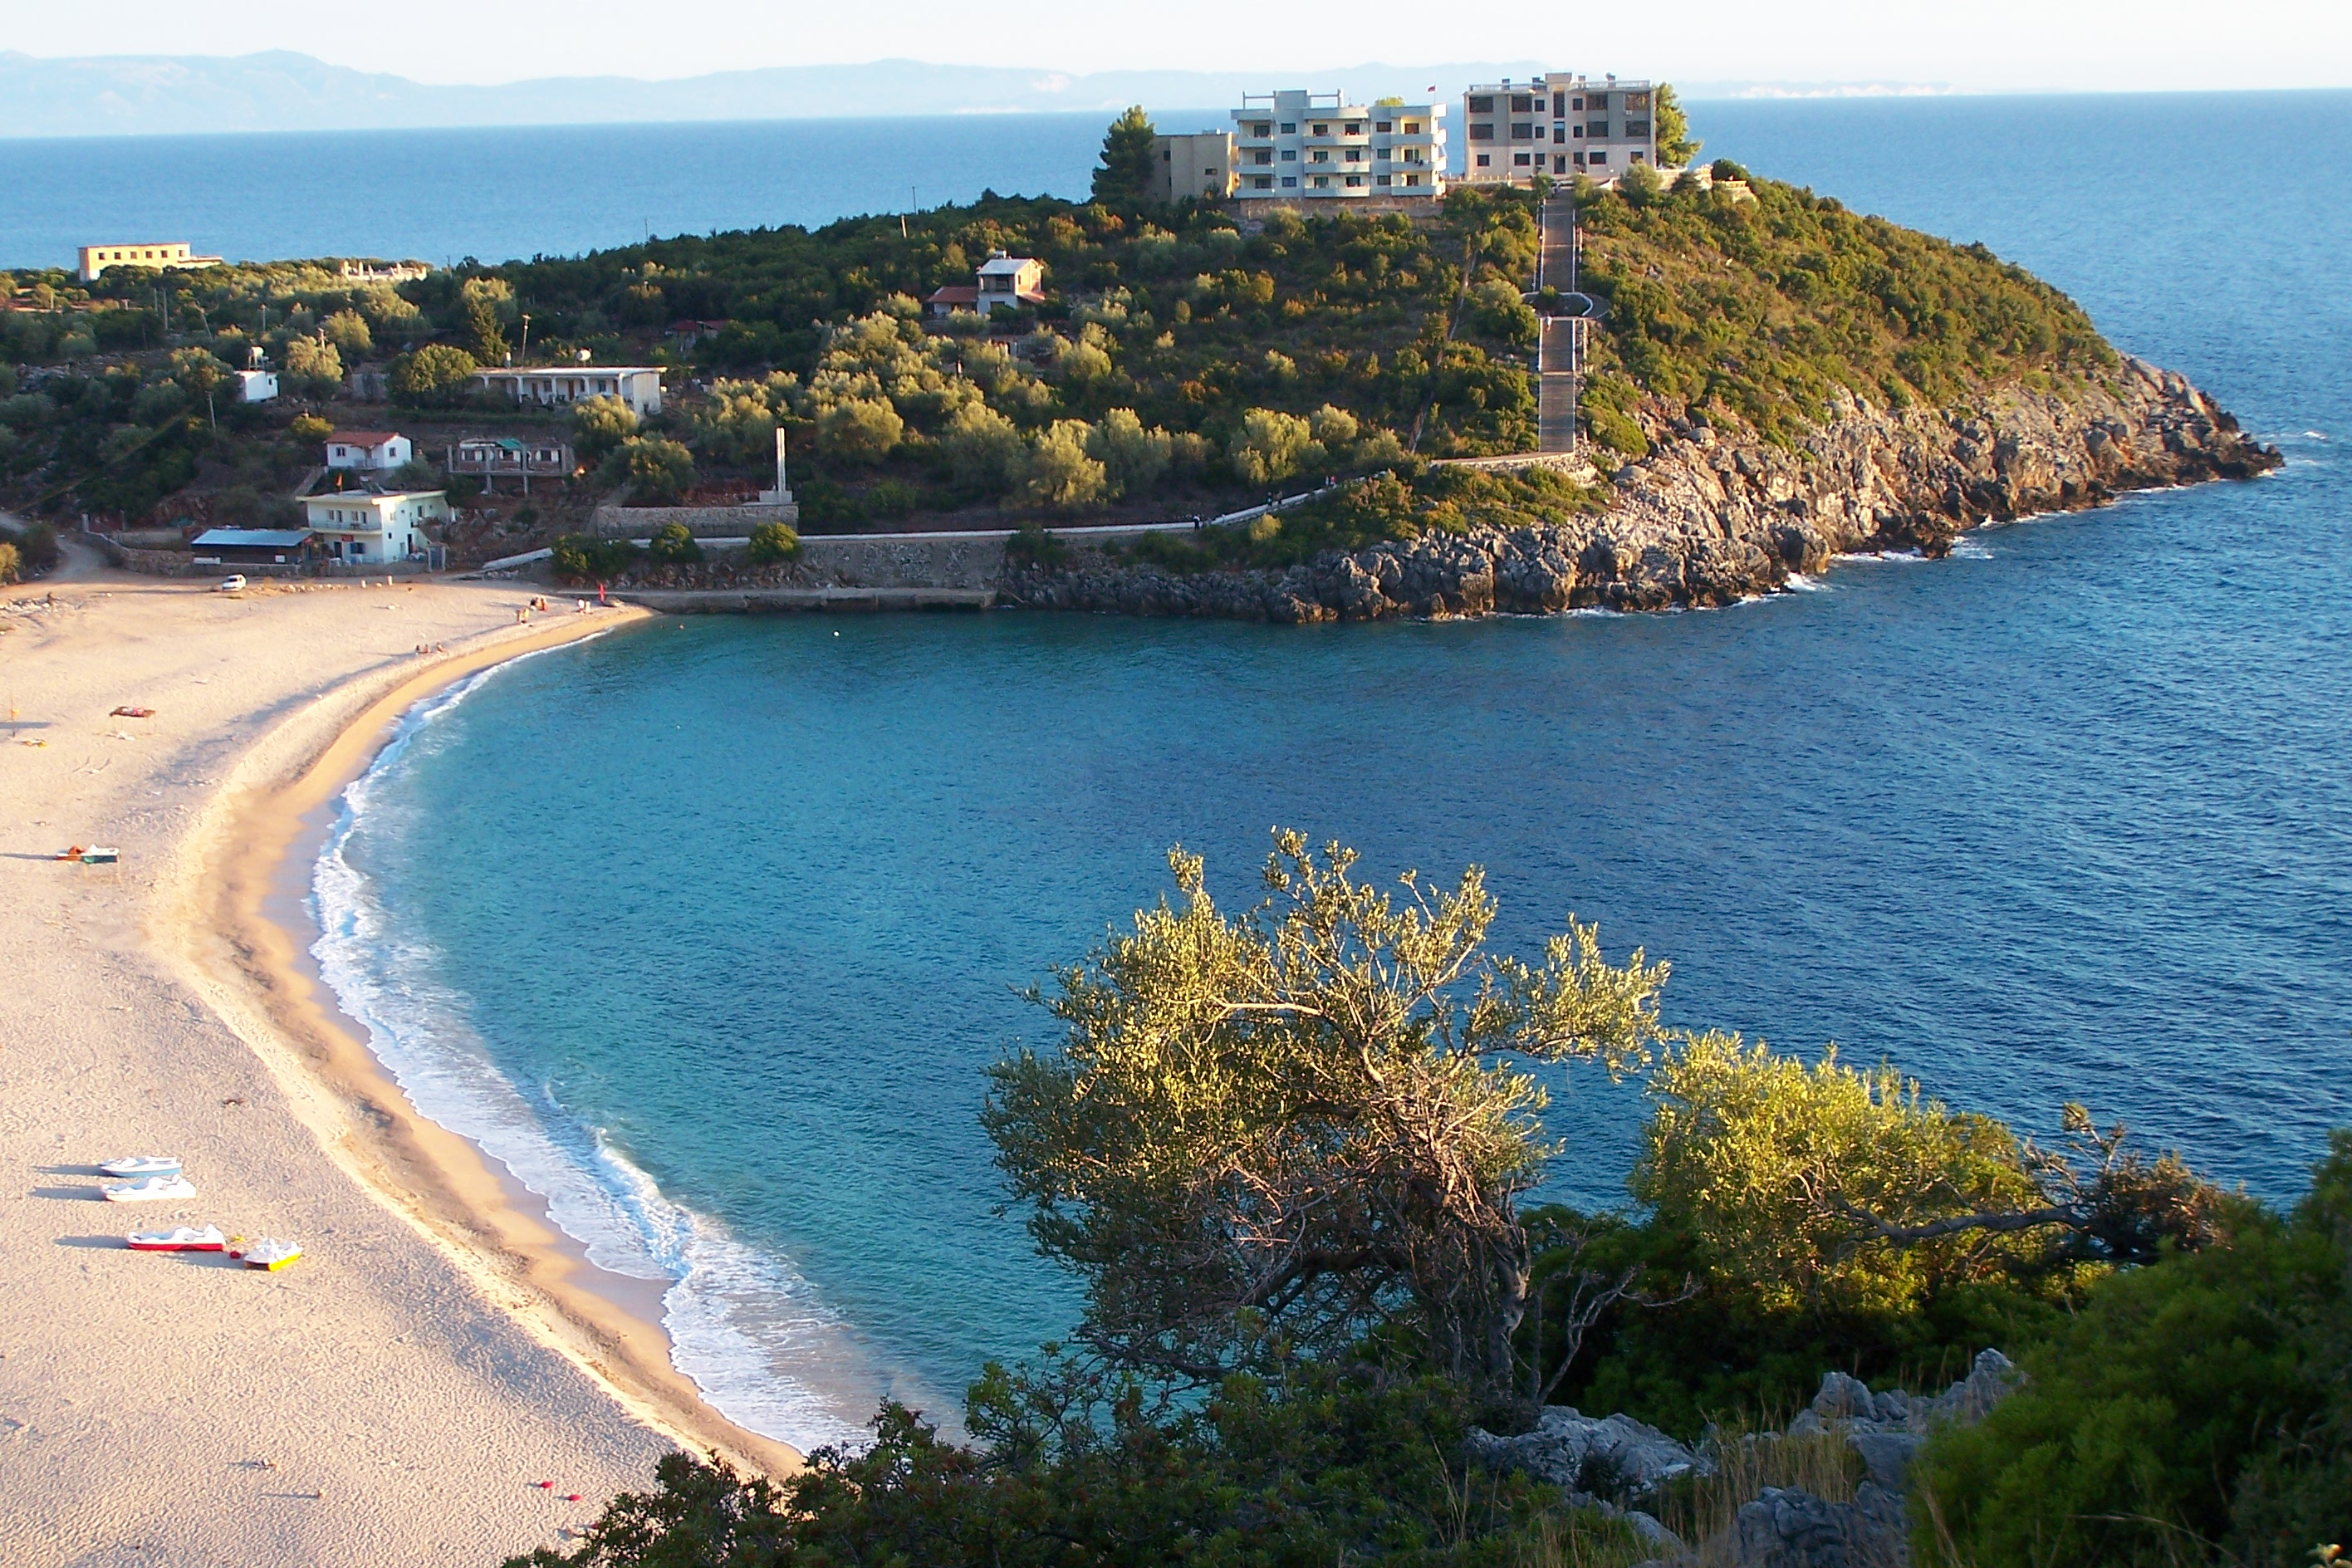 Albania Beach File:jala Beach Vlora Albania